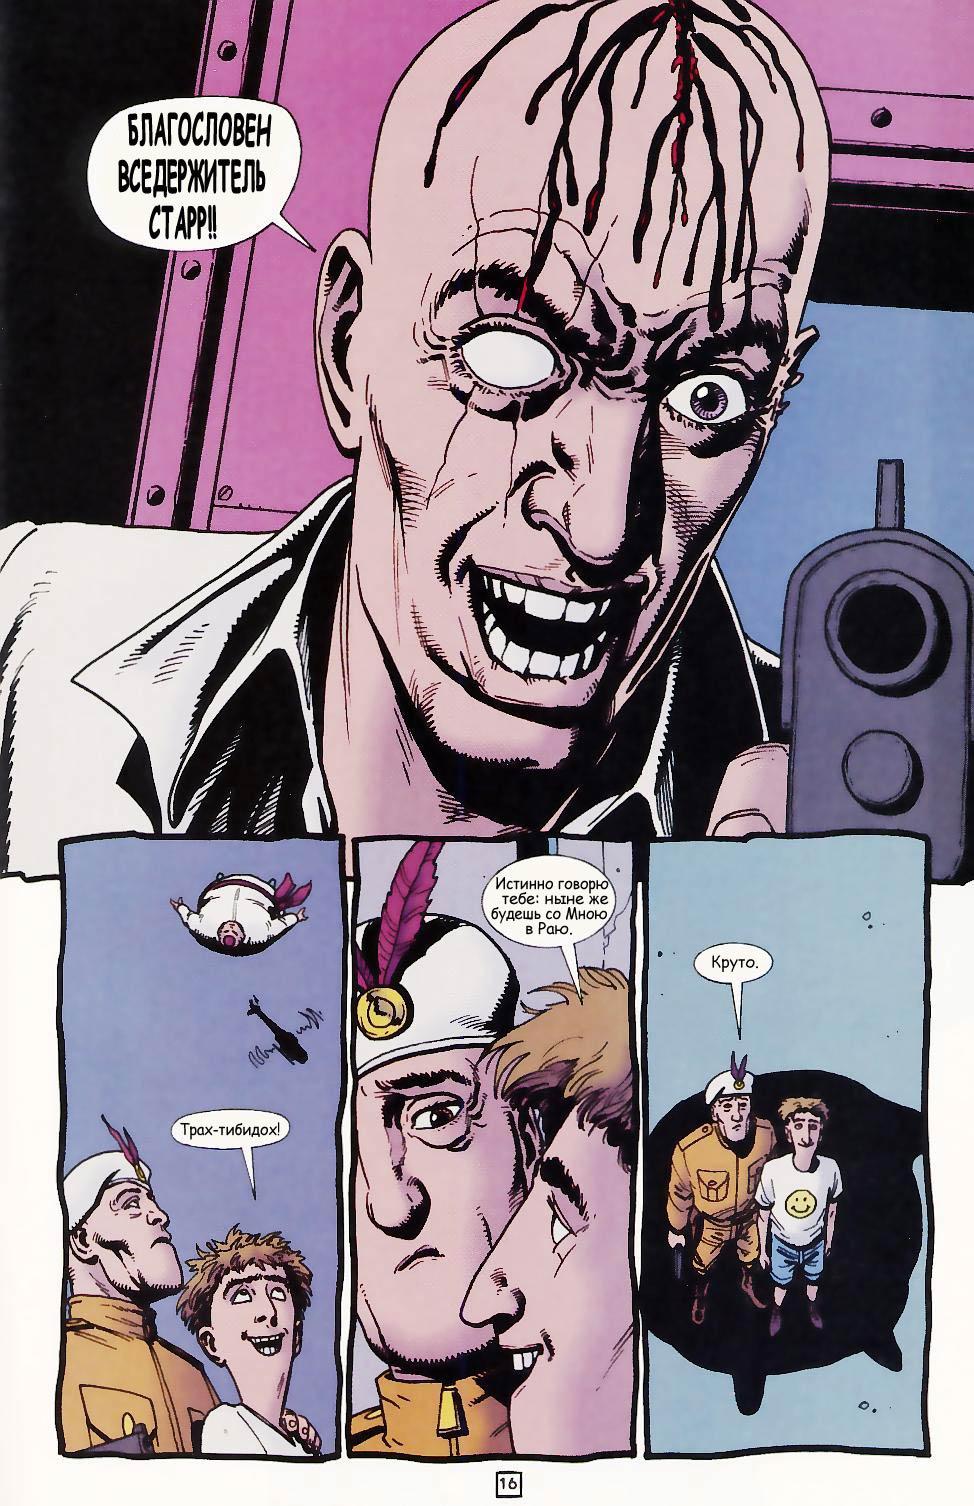 Трах комиксы онлайн